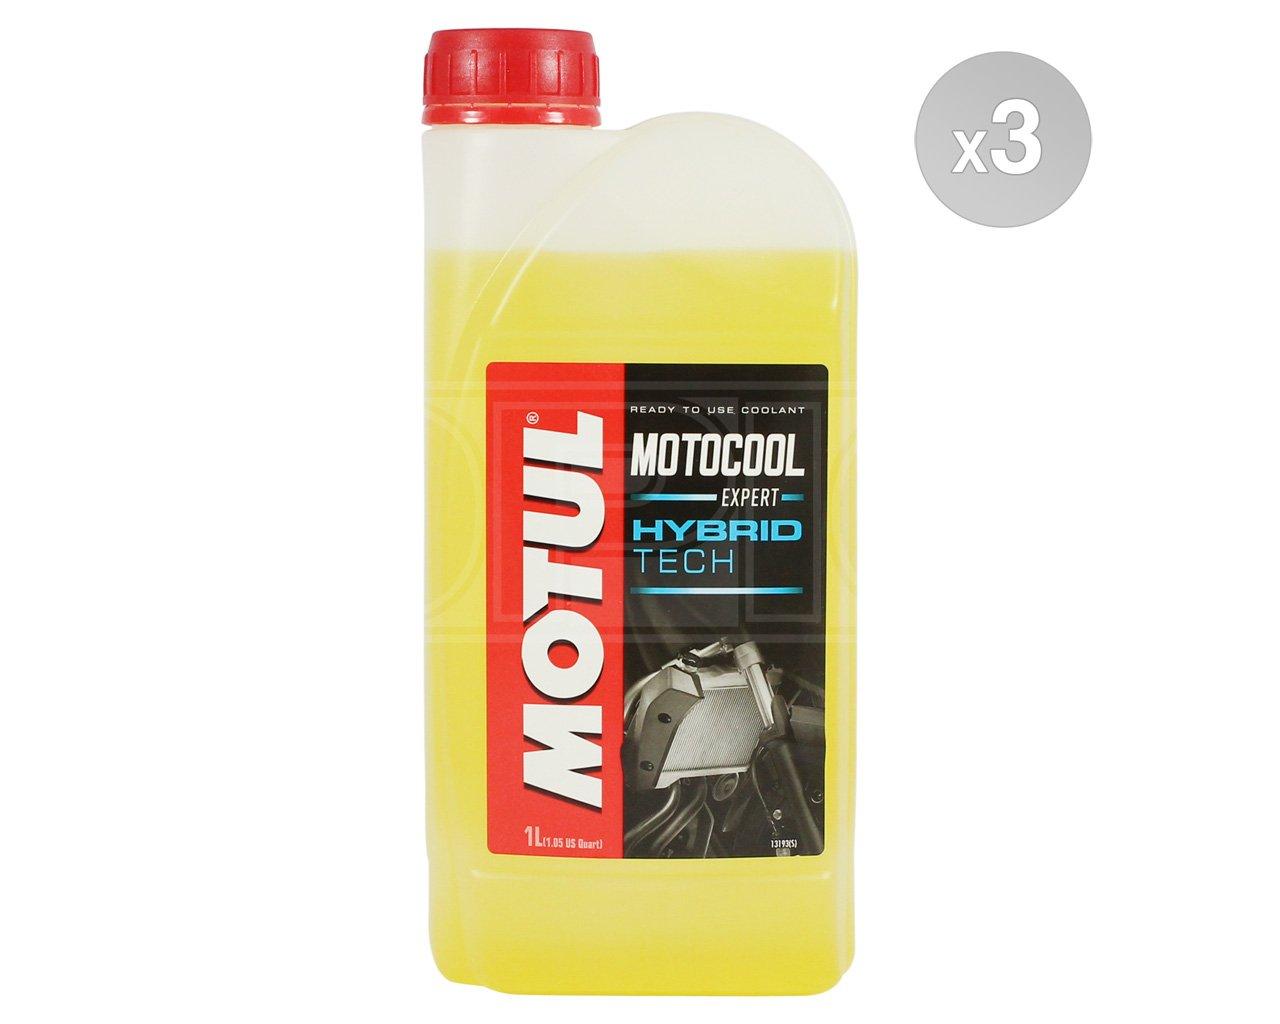 Motul MOTOCOOL EXPERT Hybrid Tech Motorcycle Coolant / Anitfreeze - Ready To Use - 3 x 1 Litres Motul Bundle